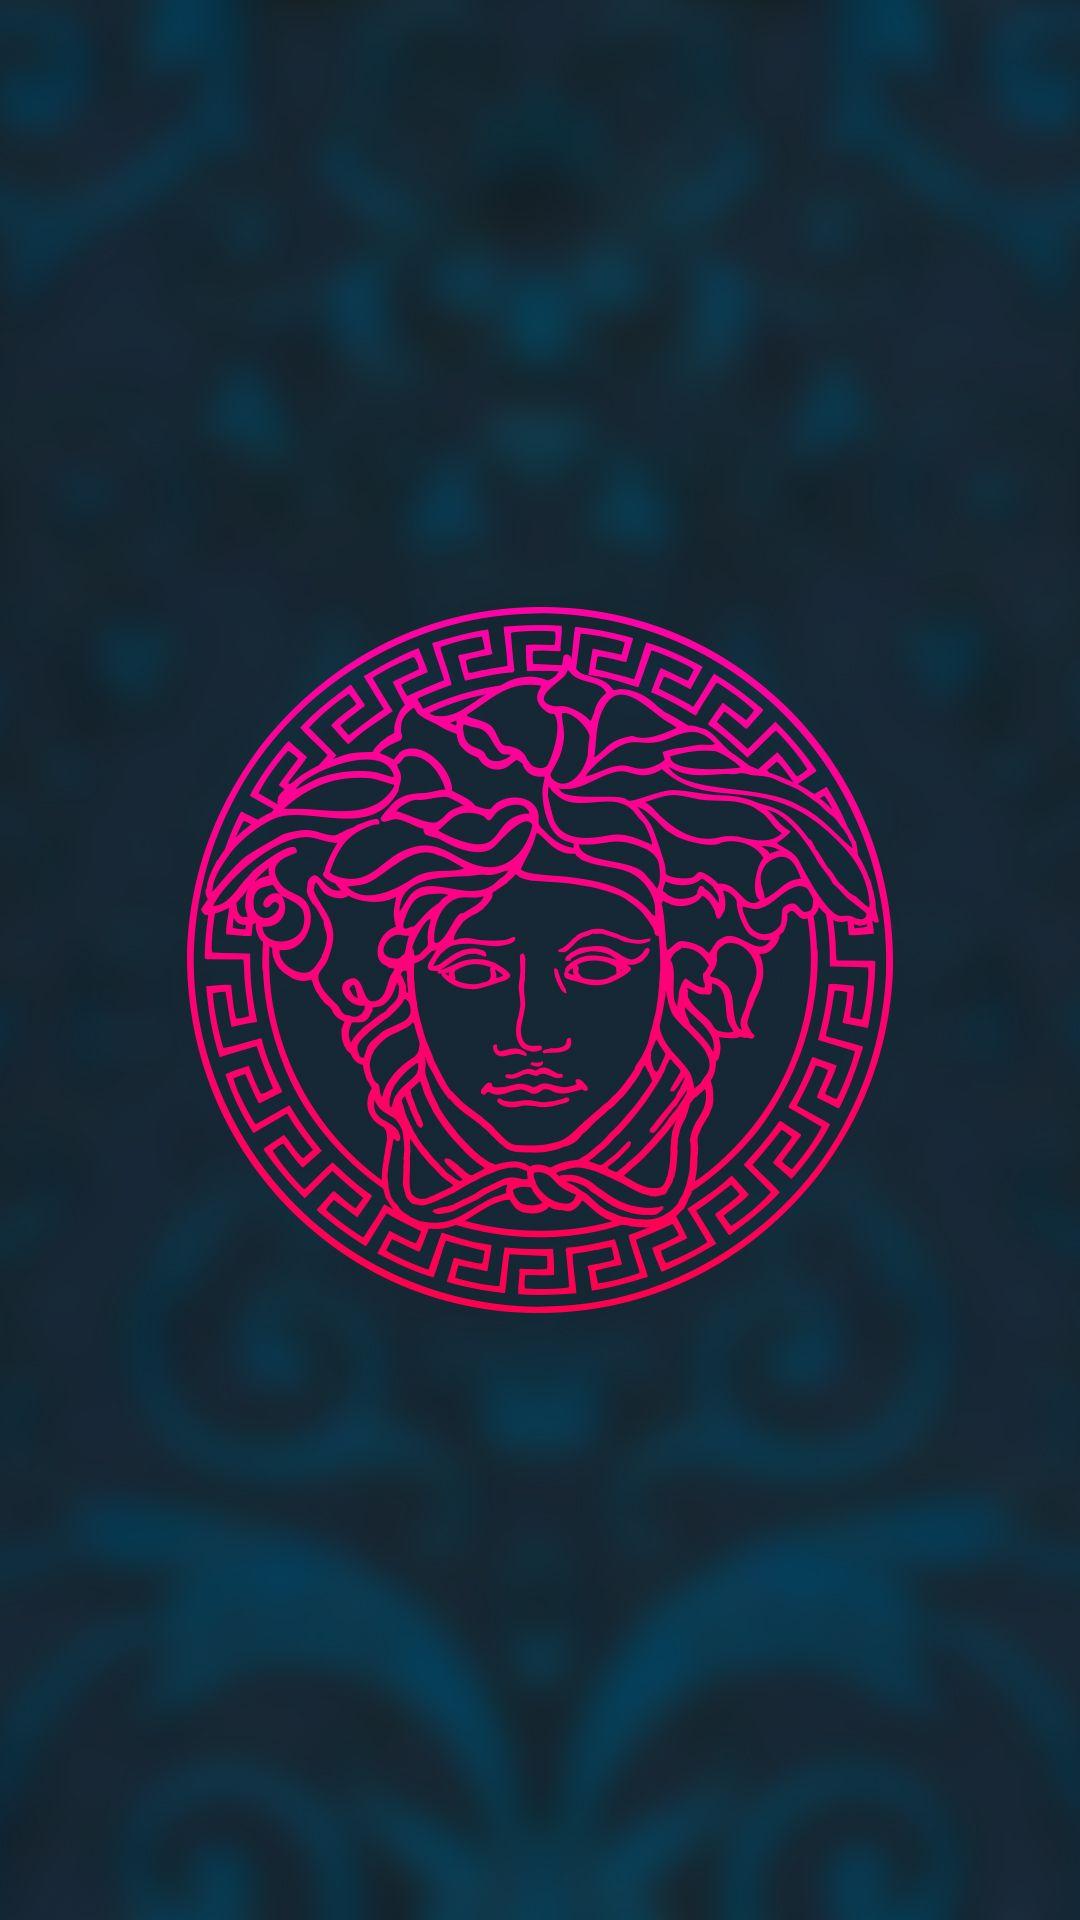 Versace Wallpaper Background Phone Simple Clean Minimalism Illustration Versace Medusa